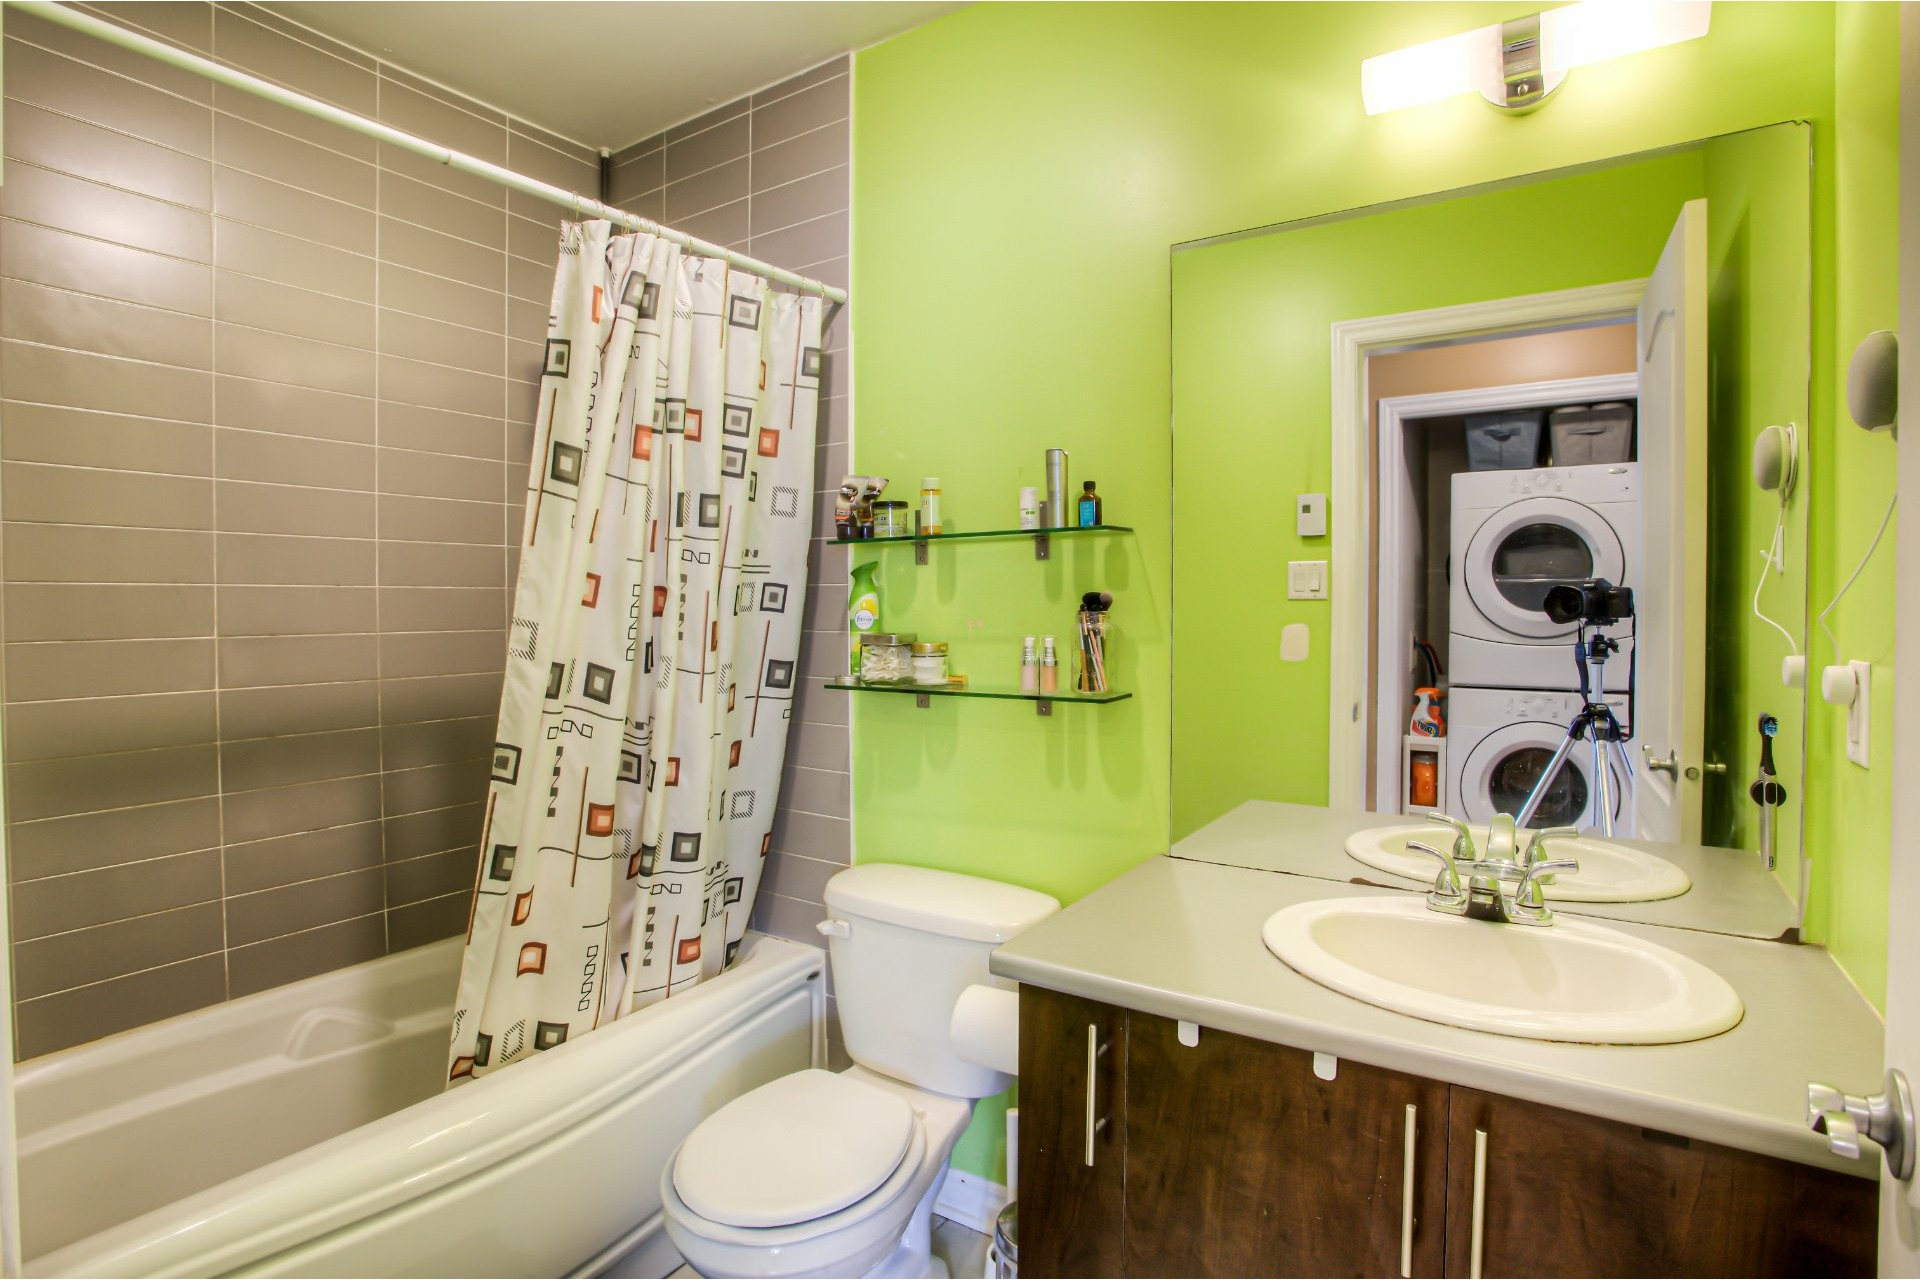 image 15 - Departamento Para alquiler Villeray/Saint-Michel/Parc-Extension Montréal  - 5 habitaciones